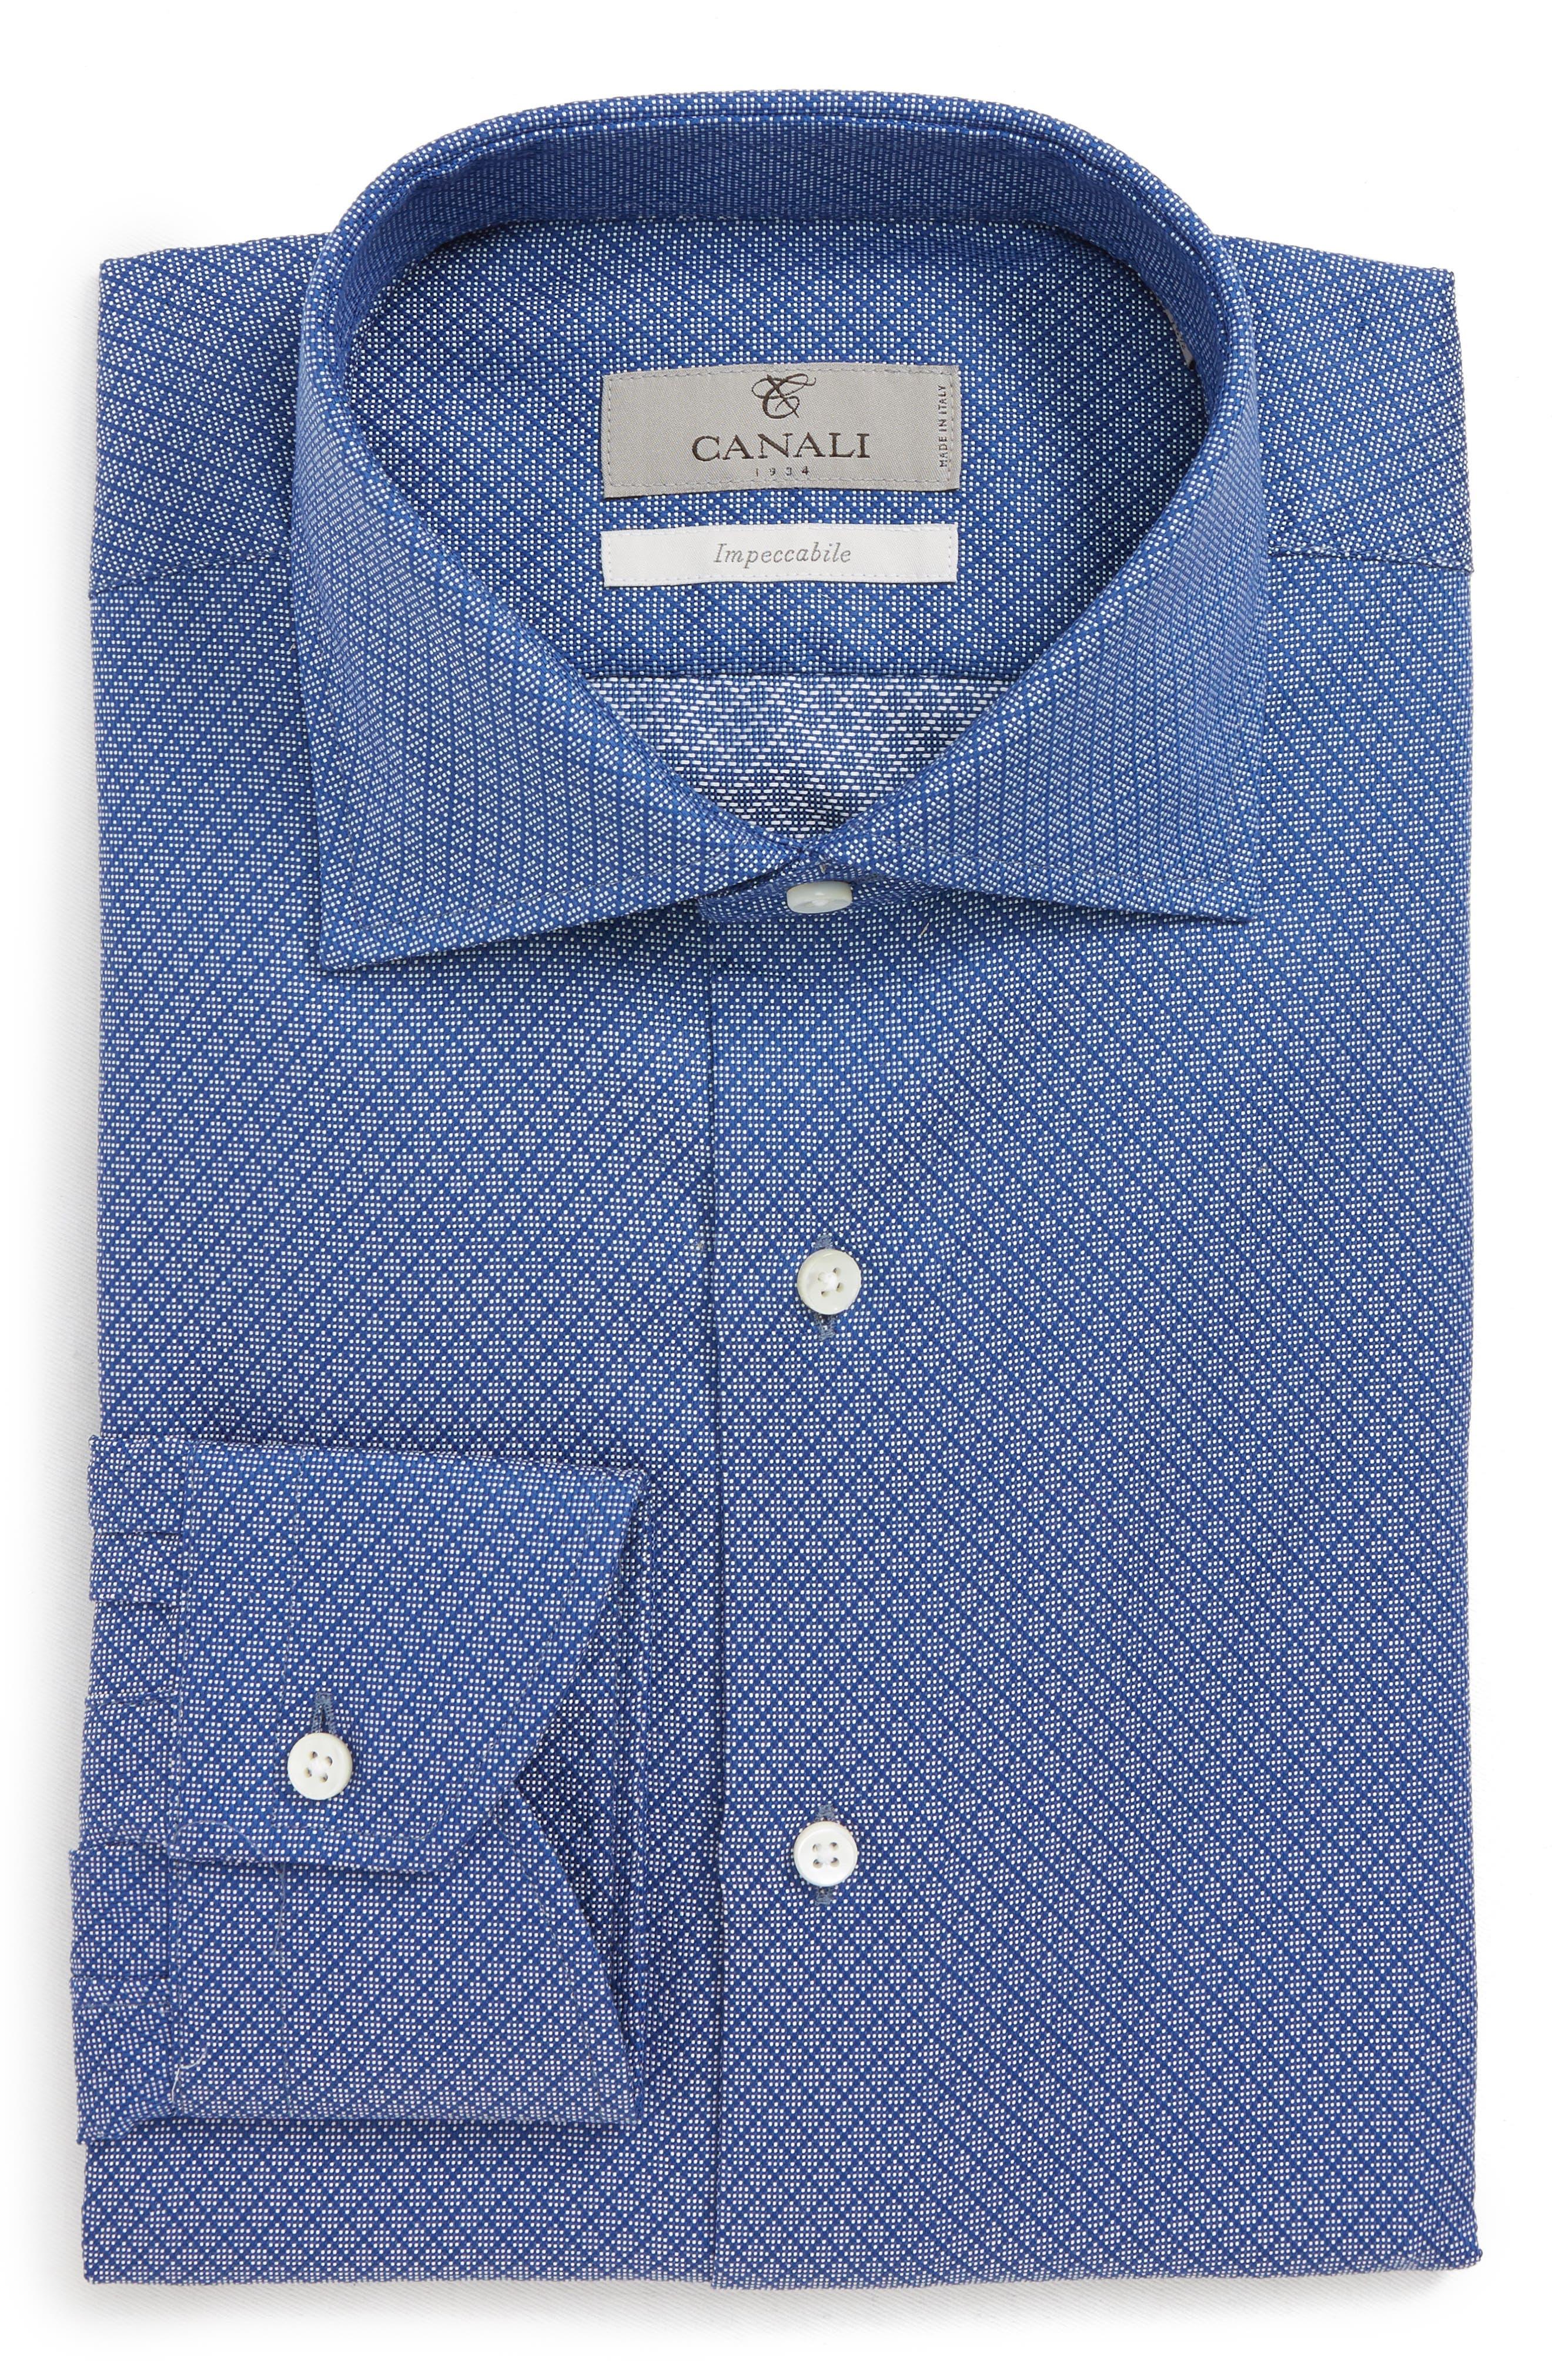 Trim Fit Print Dress Shirt,                         Main,                         color, DARK BLUE